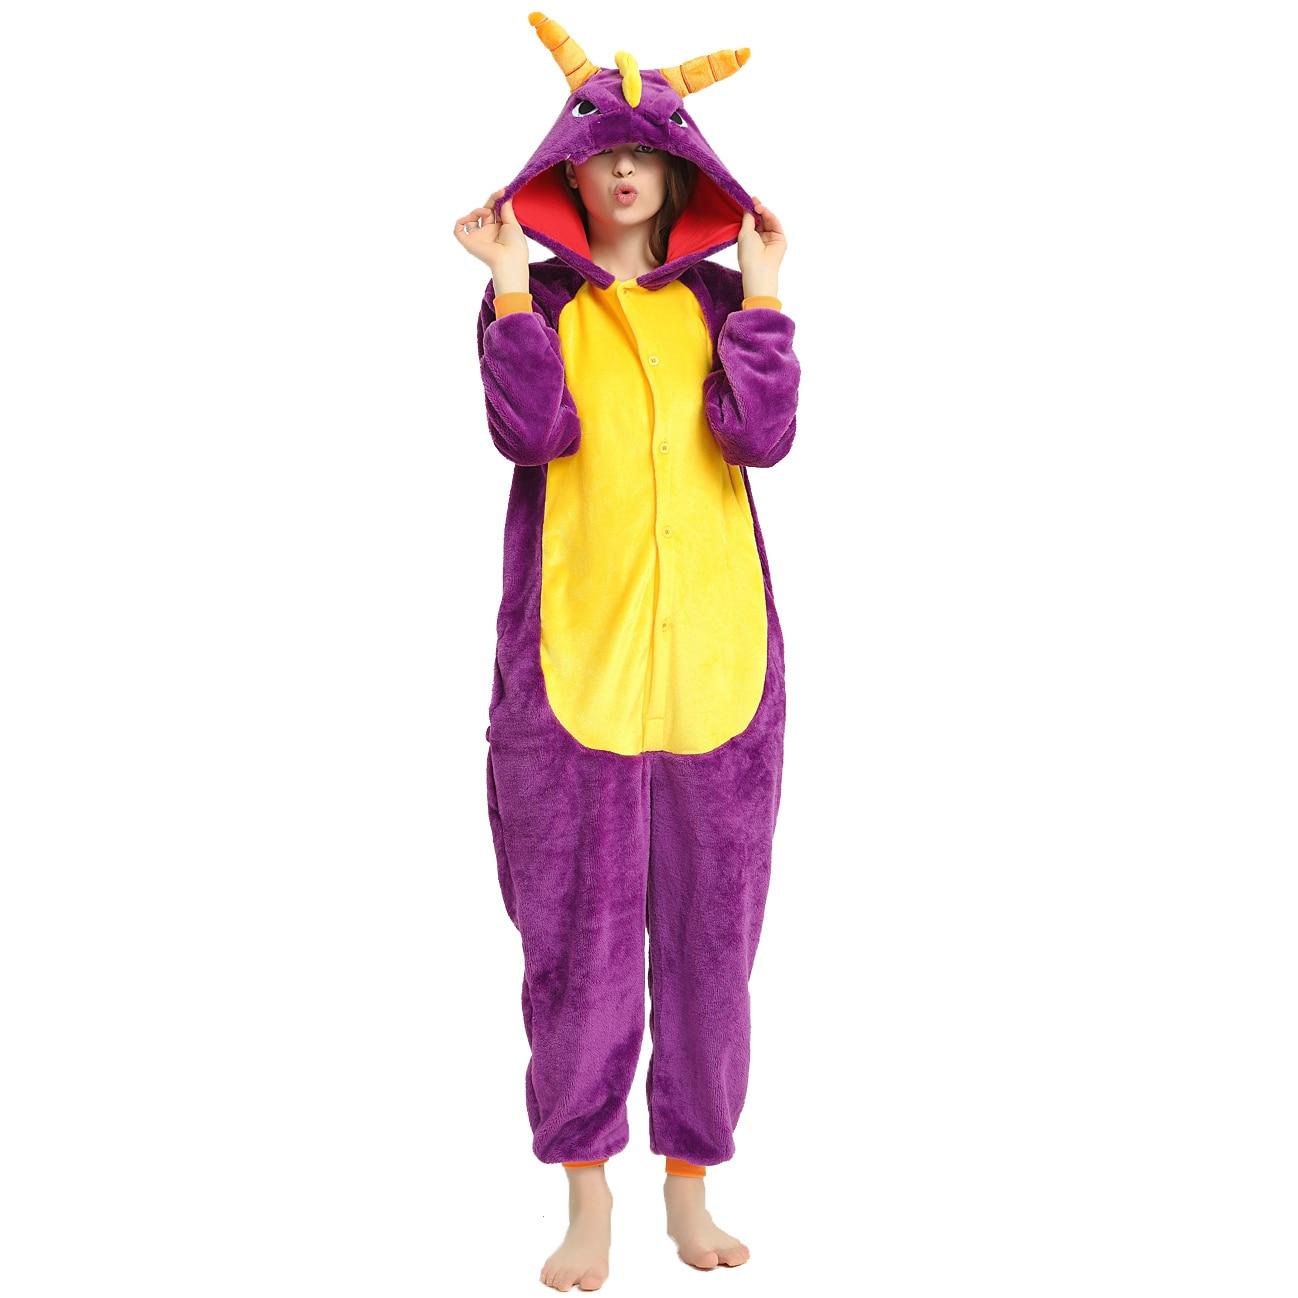 Spyro Onesies disfraces de invierno Anime Stitch Unicornio Onesies mujeres hombres ropa de dormir Unicornio Pijima adultos pijamas de franela